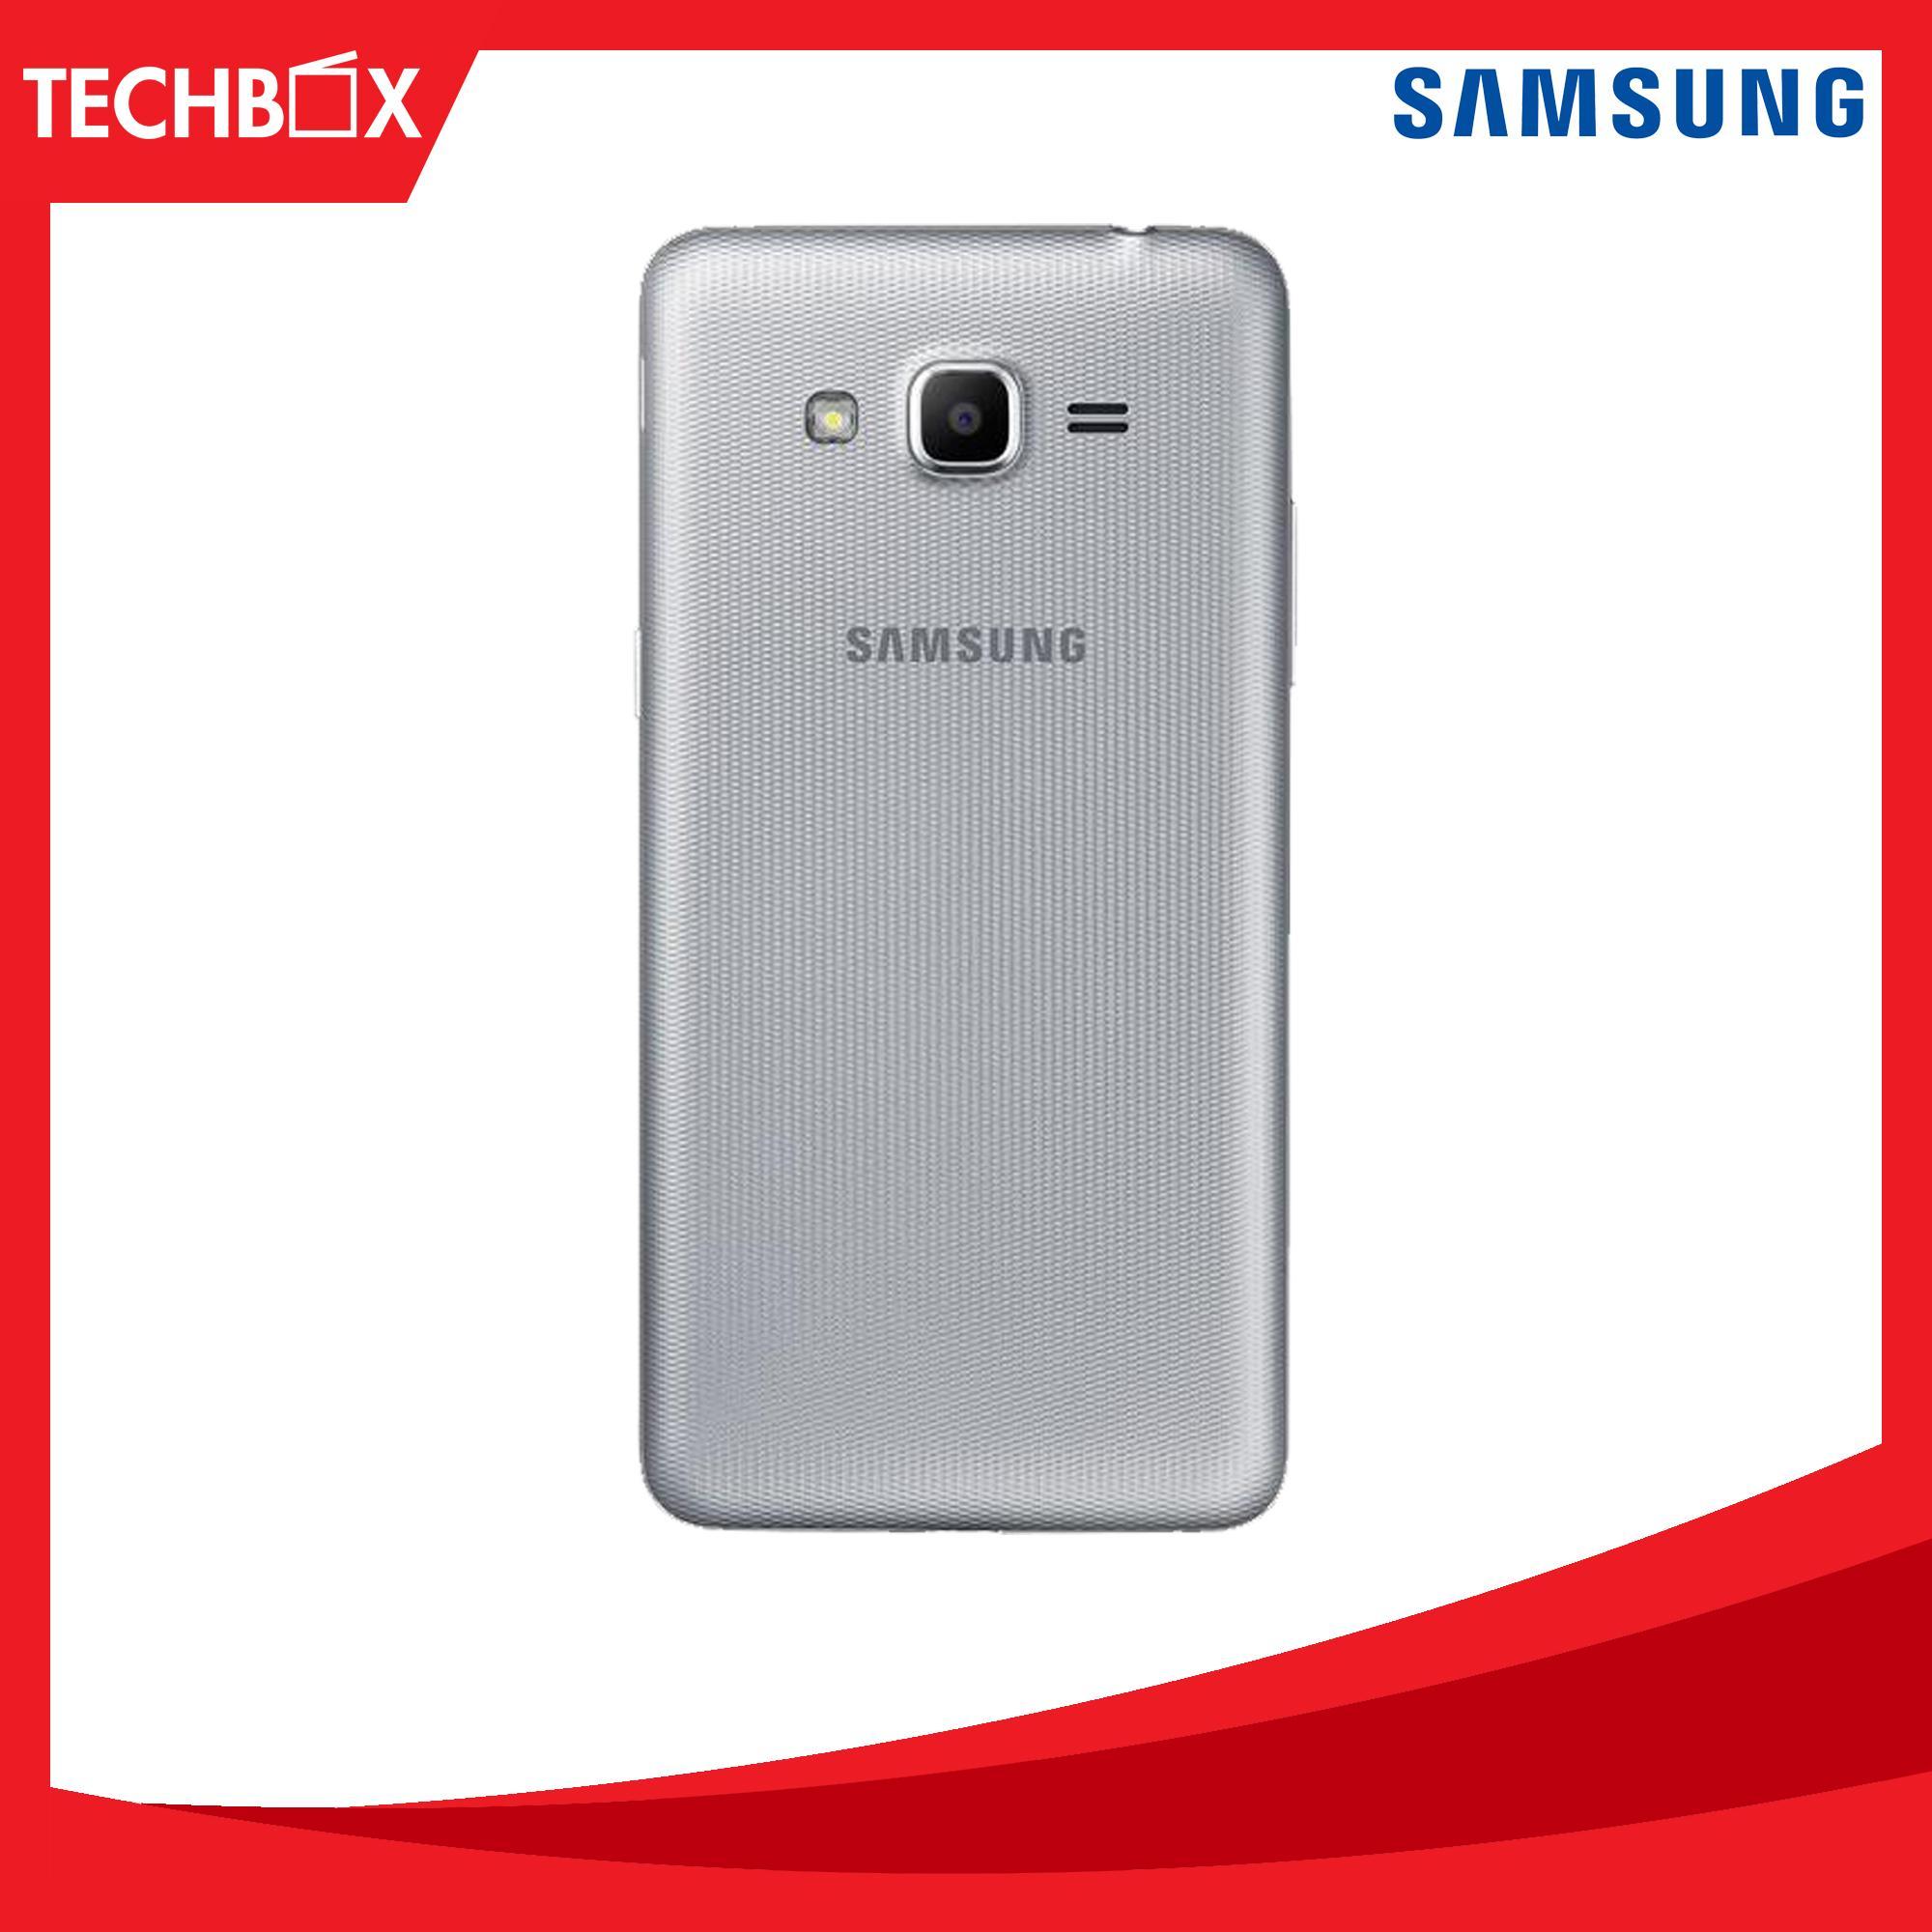 Samsung Galaxy J2 Prime Dual SIM 5 8 MP 5 MP Cameras 1